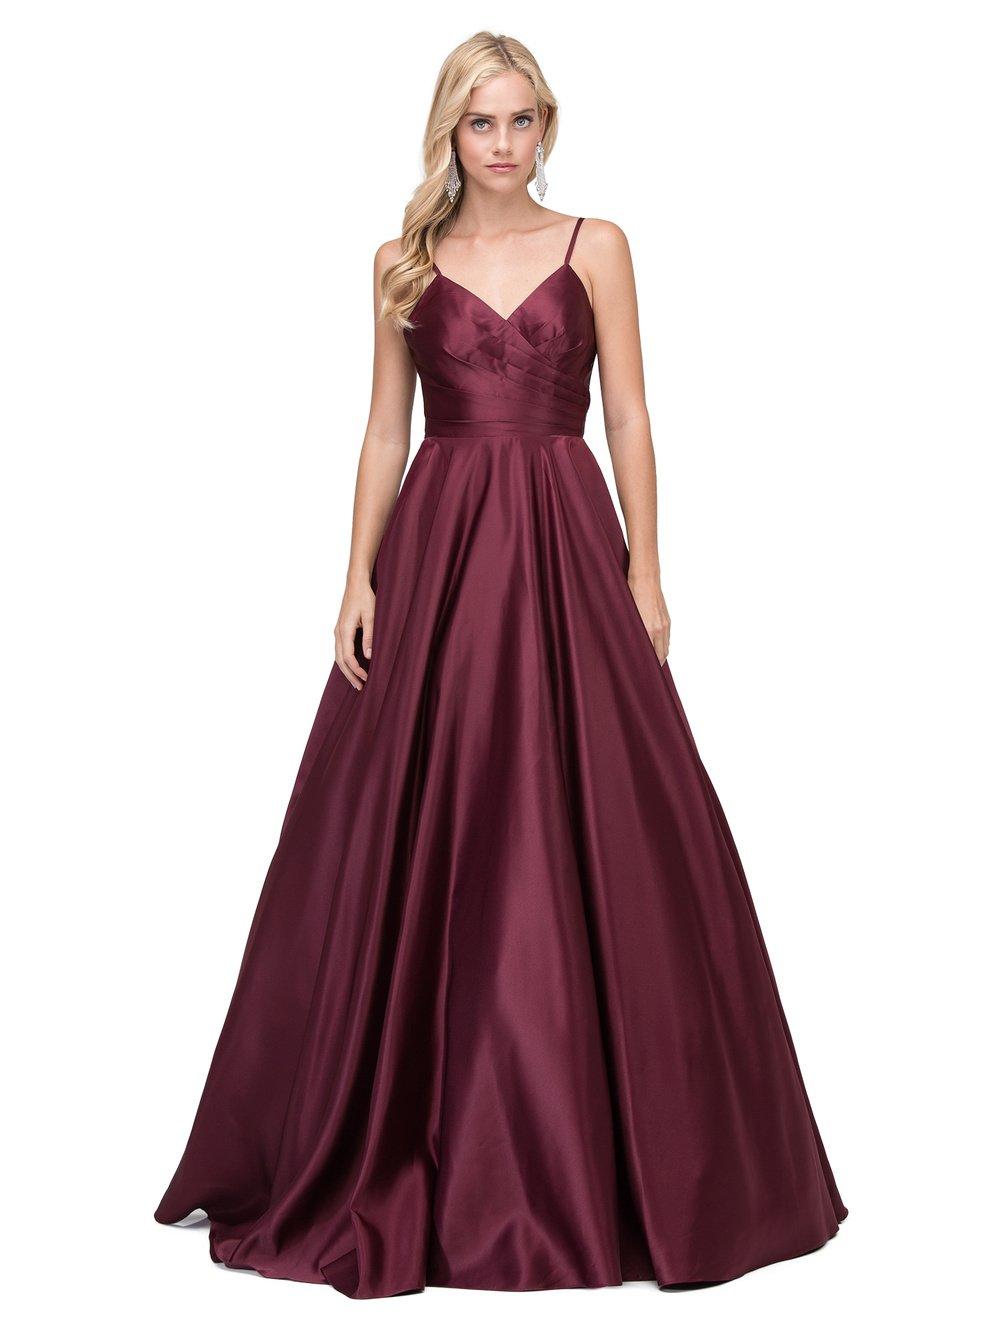 Wine Long V-Neck Prom Dress with Adjustable Straps